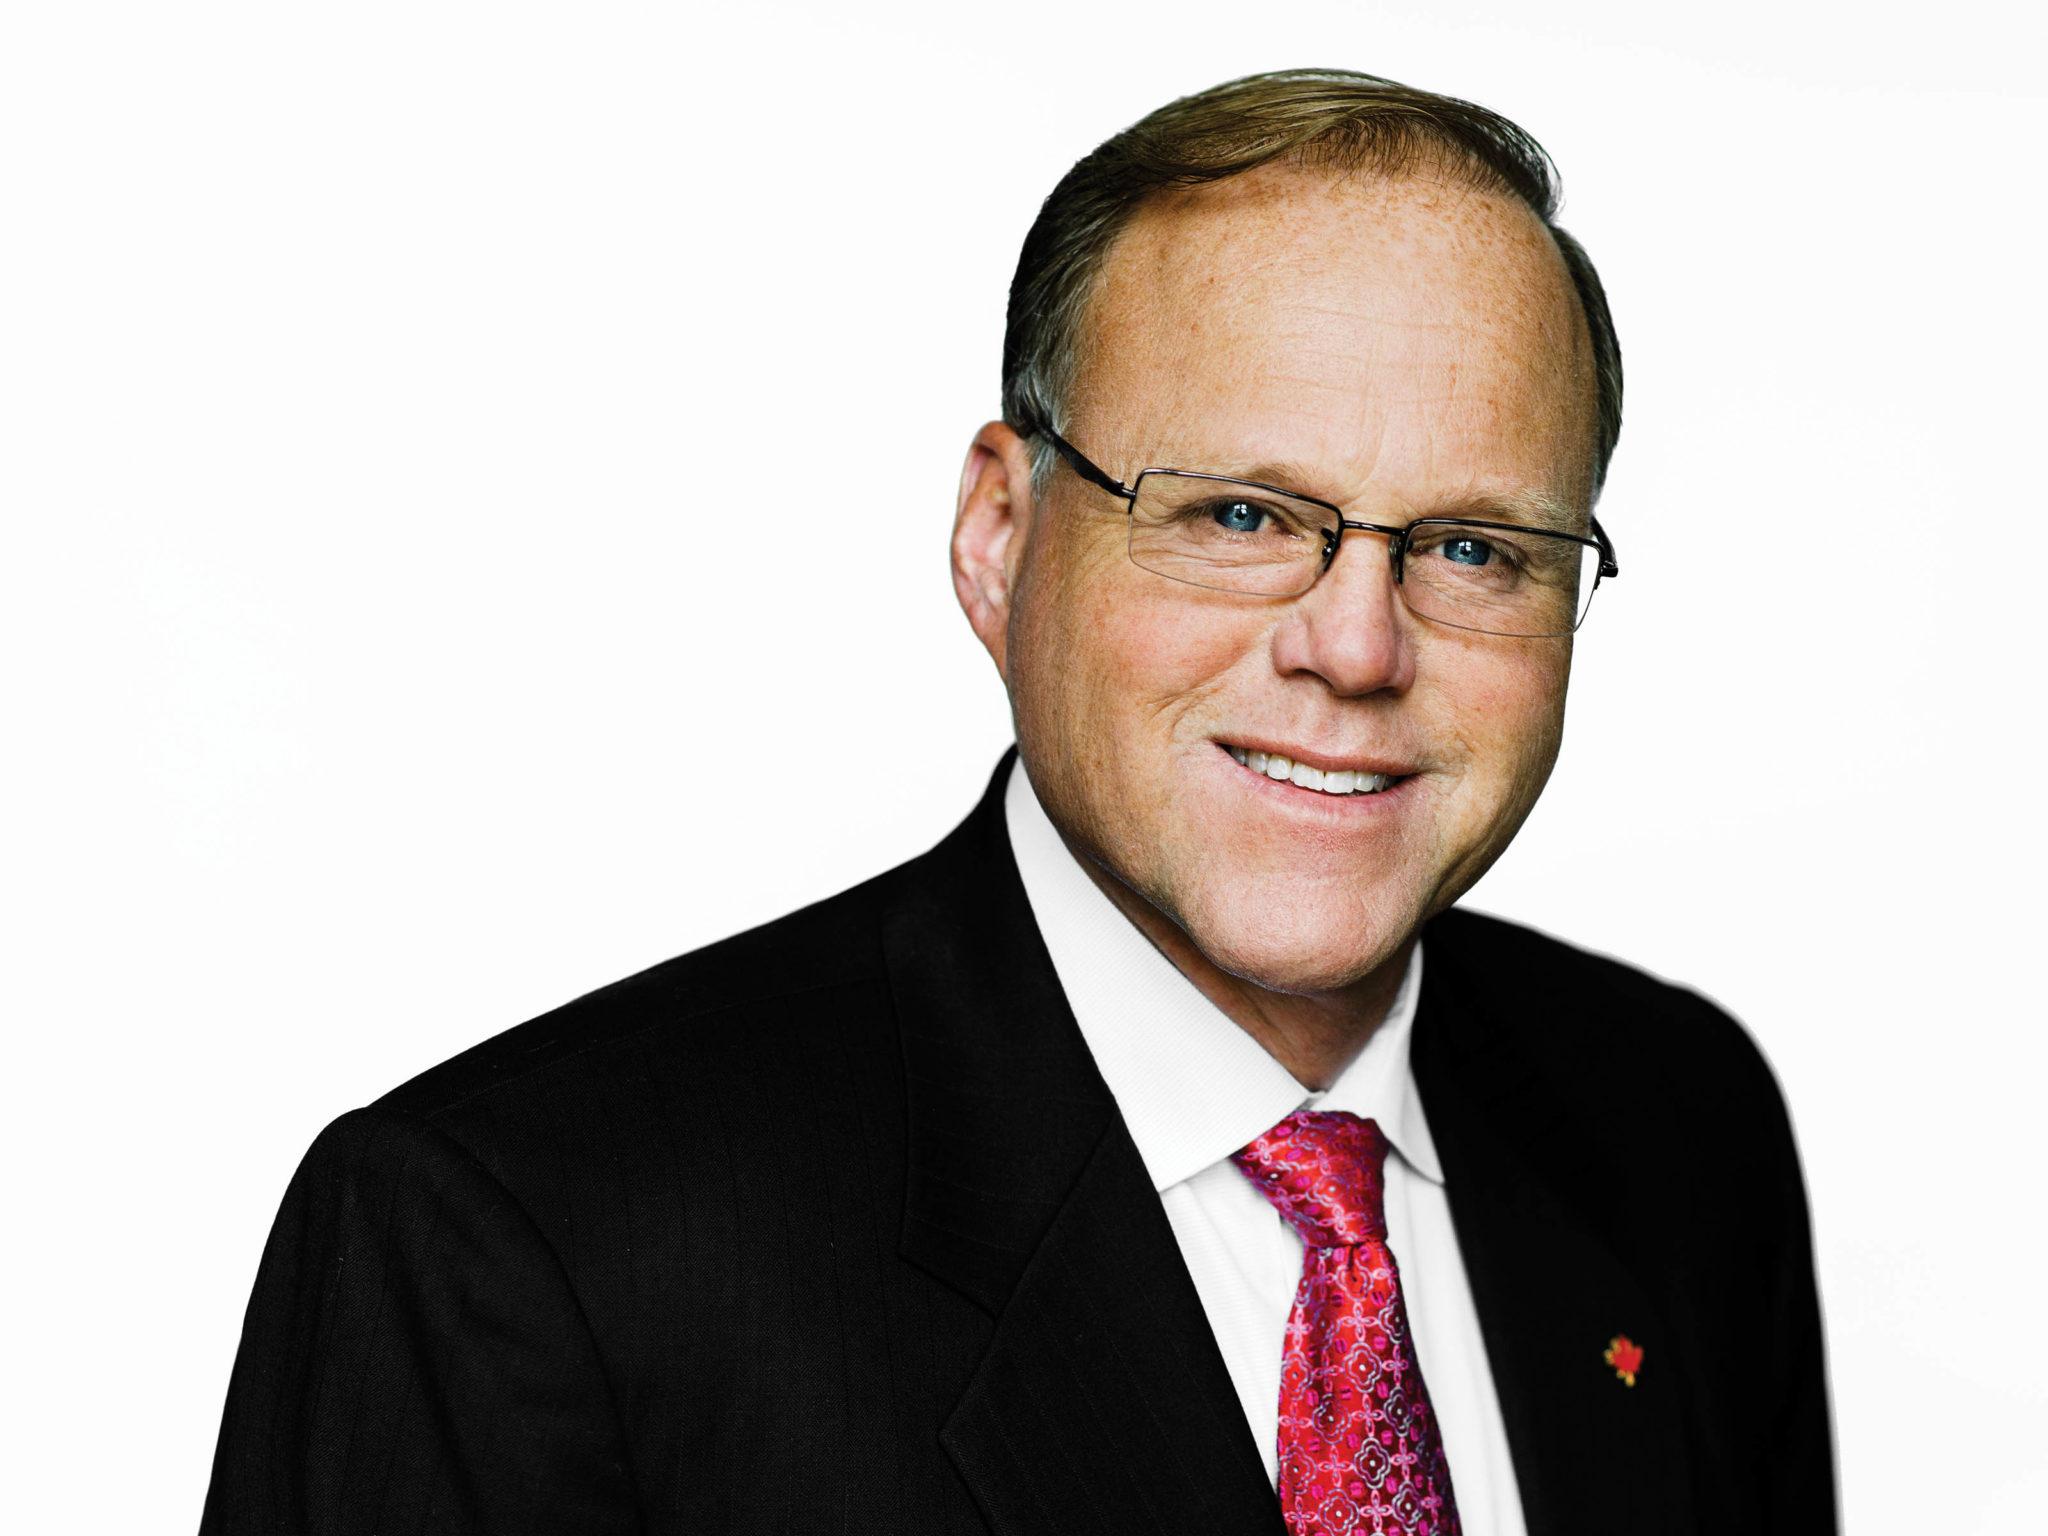 Fred Plant, President, Canadian Independent Adjusters Association